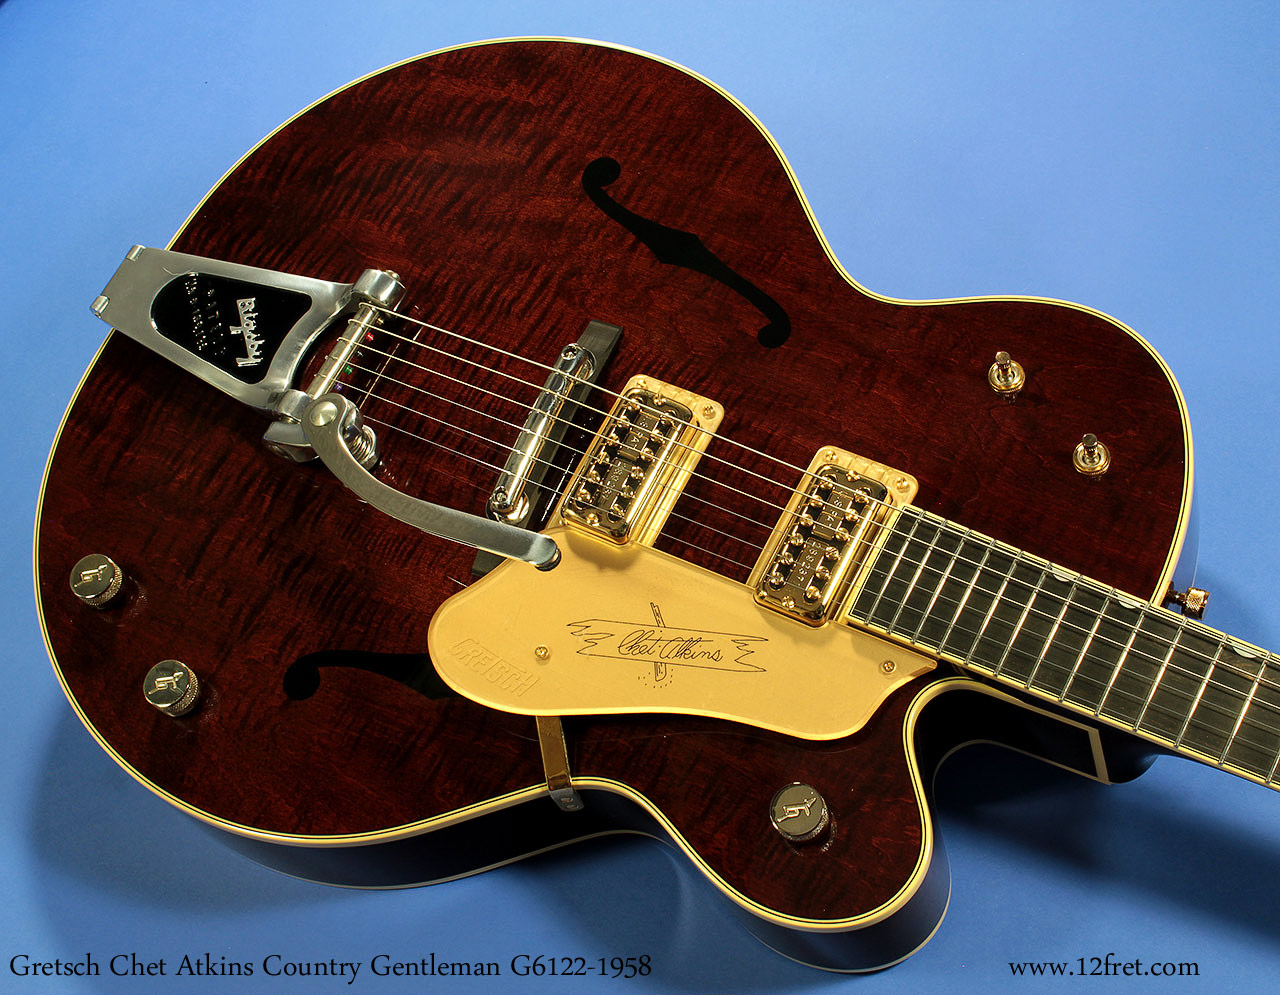 gretsch-chet-atkins-country-gent-g6122-1958-top-1